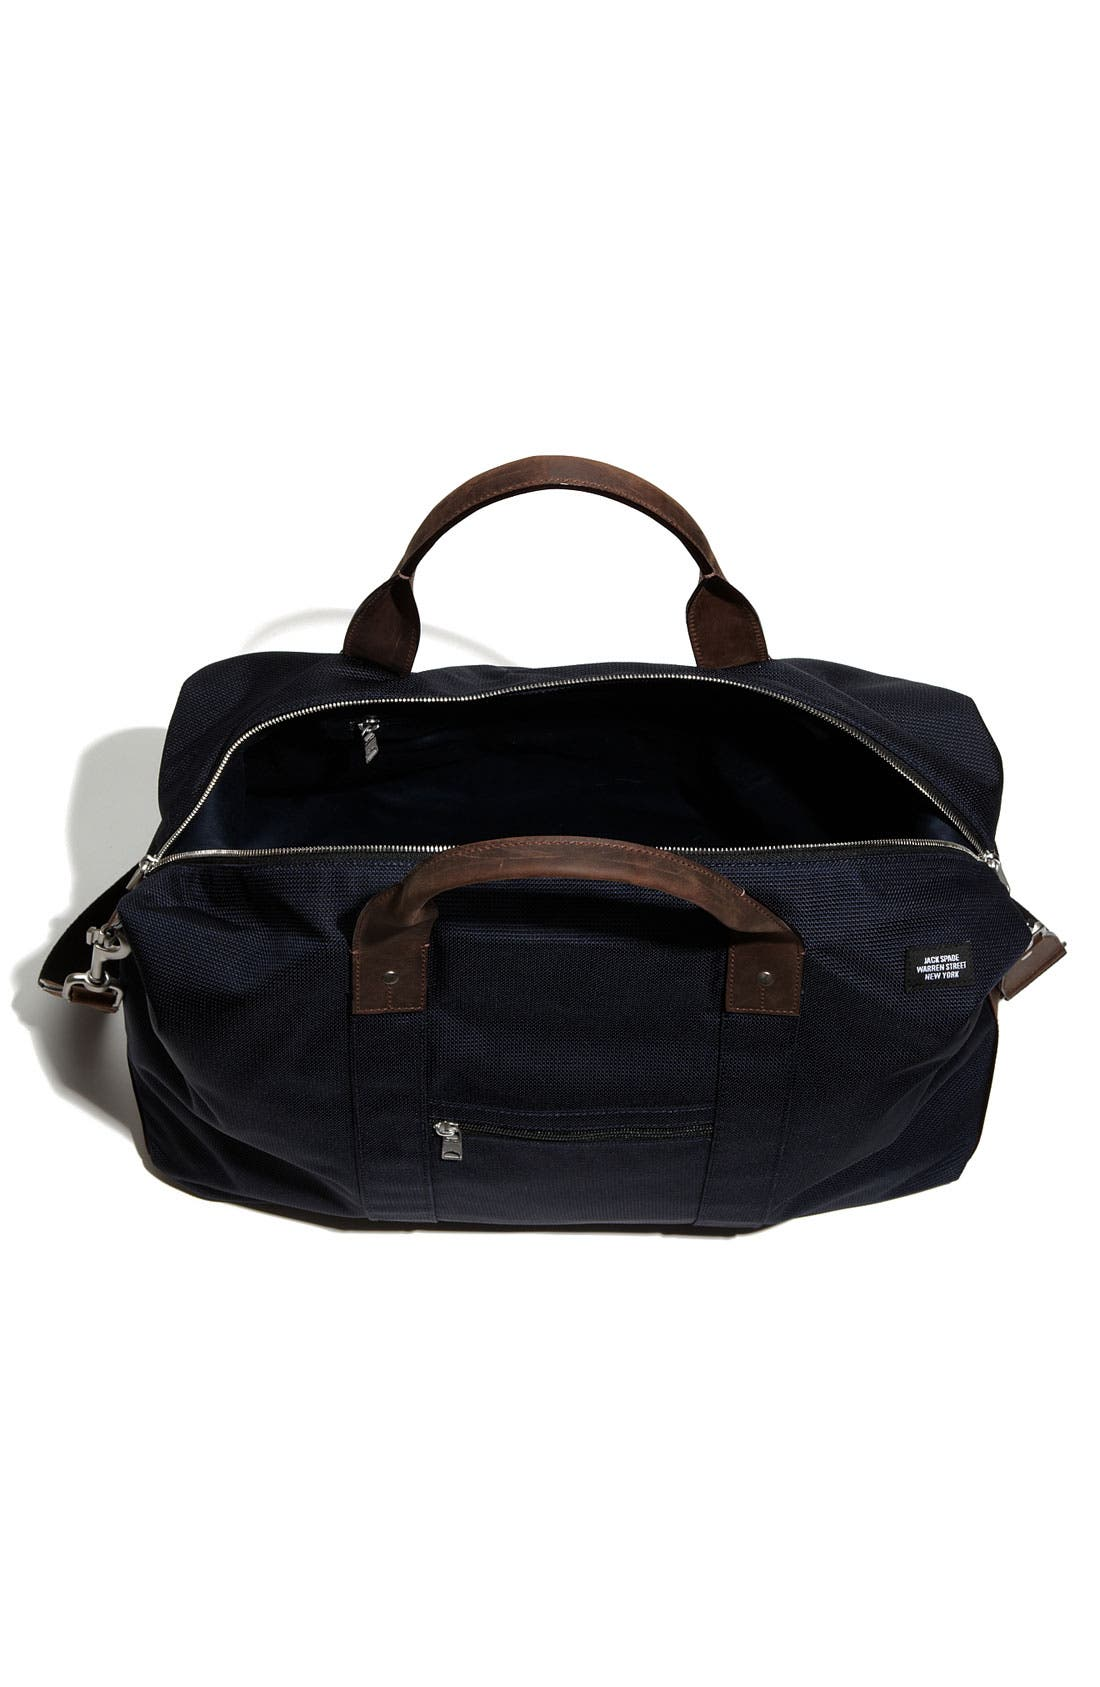 Alternate Image 3  - Jack Spade 'Wing' Nylon Duffel Bag